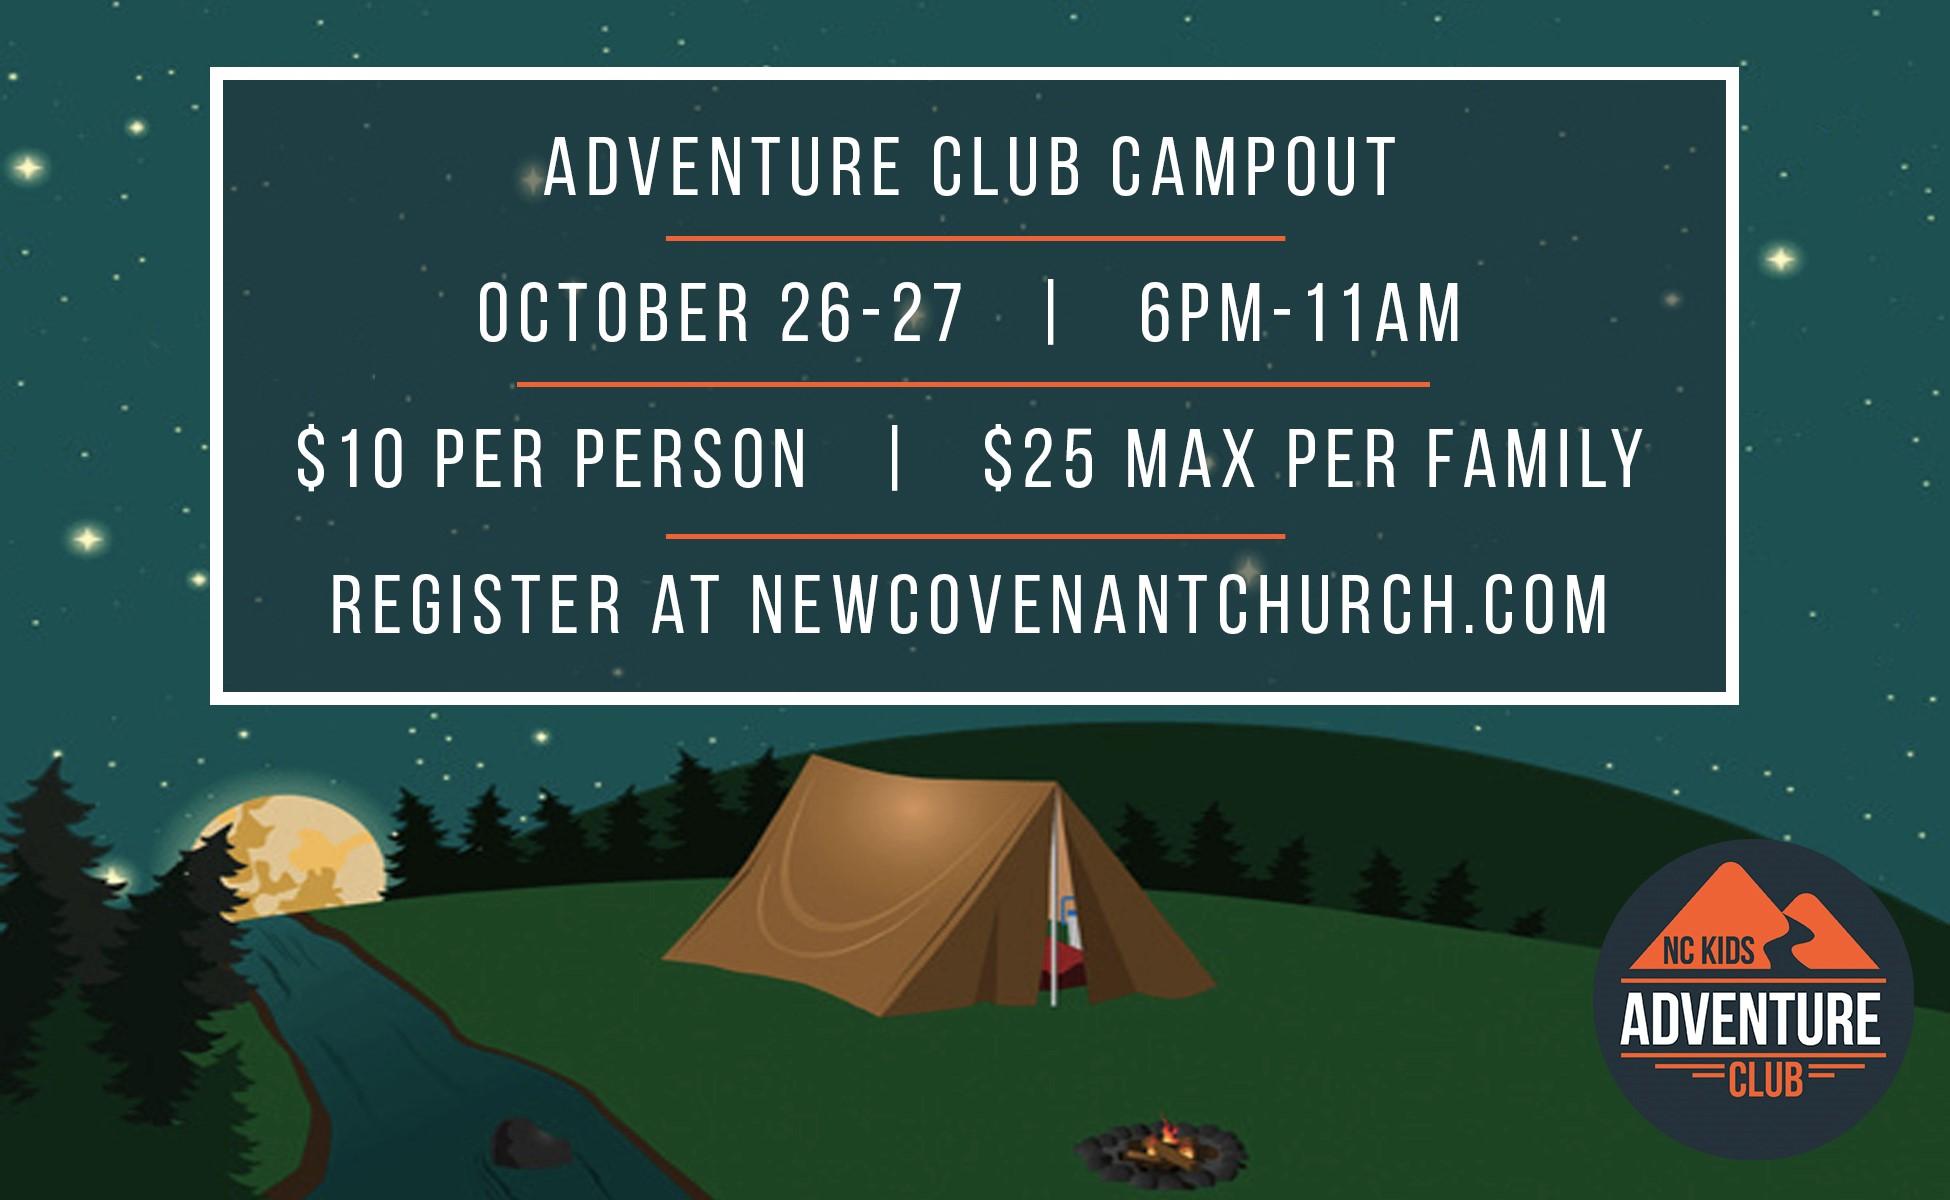 adventure-club-campout.jpg